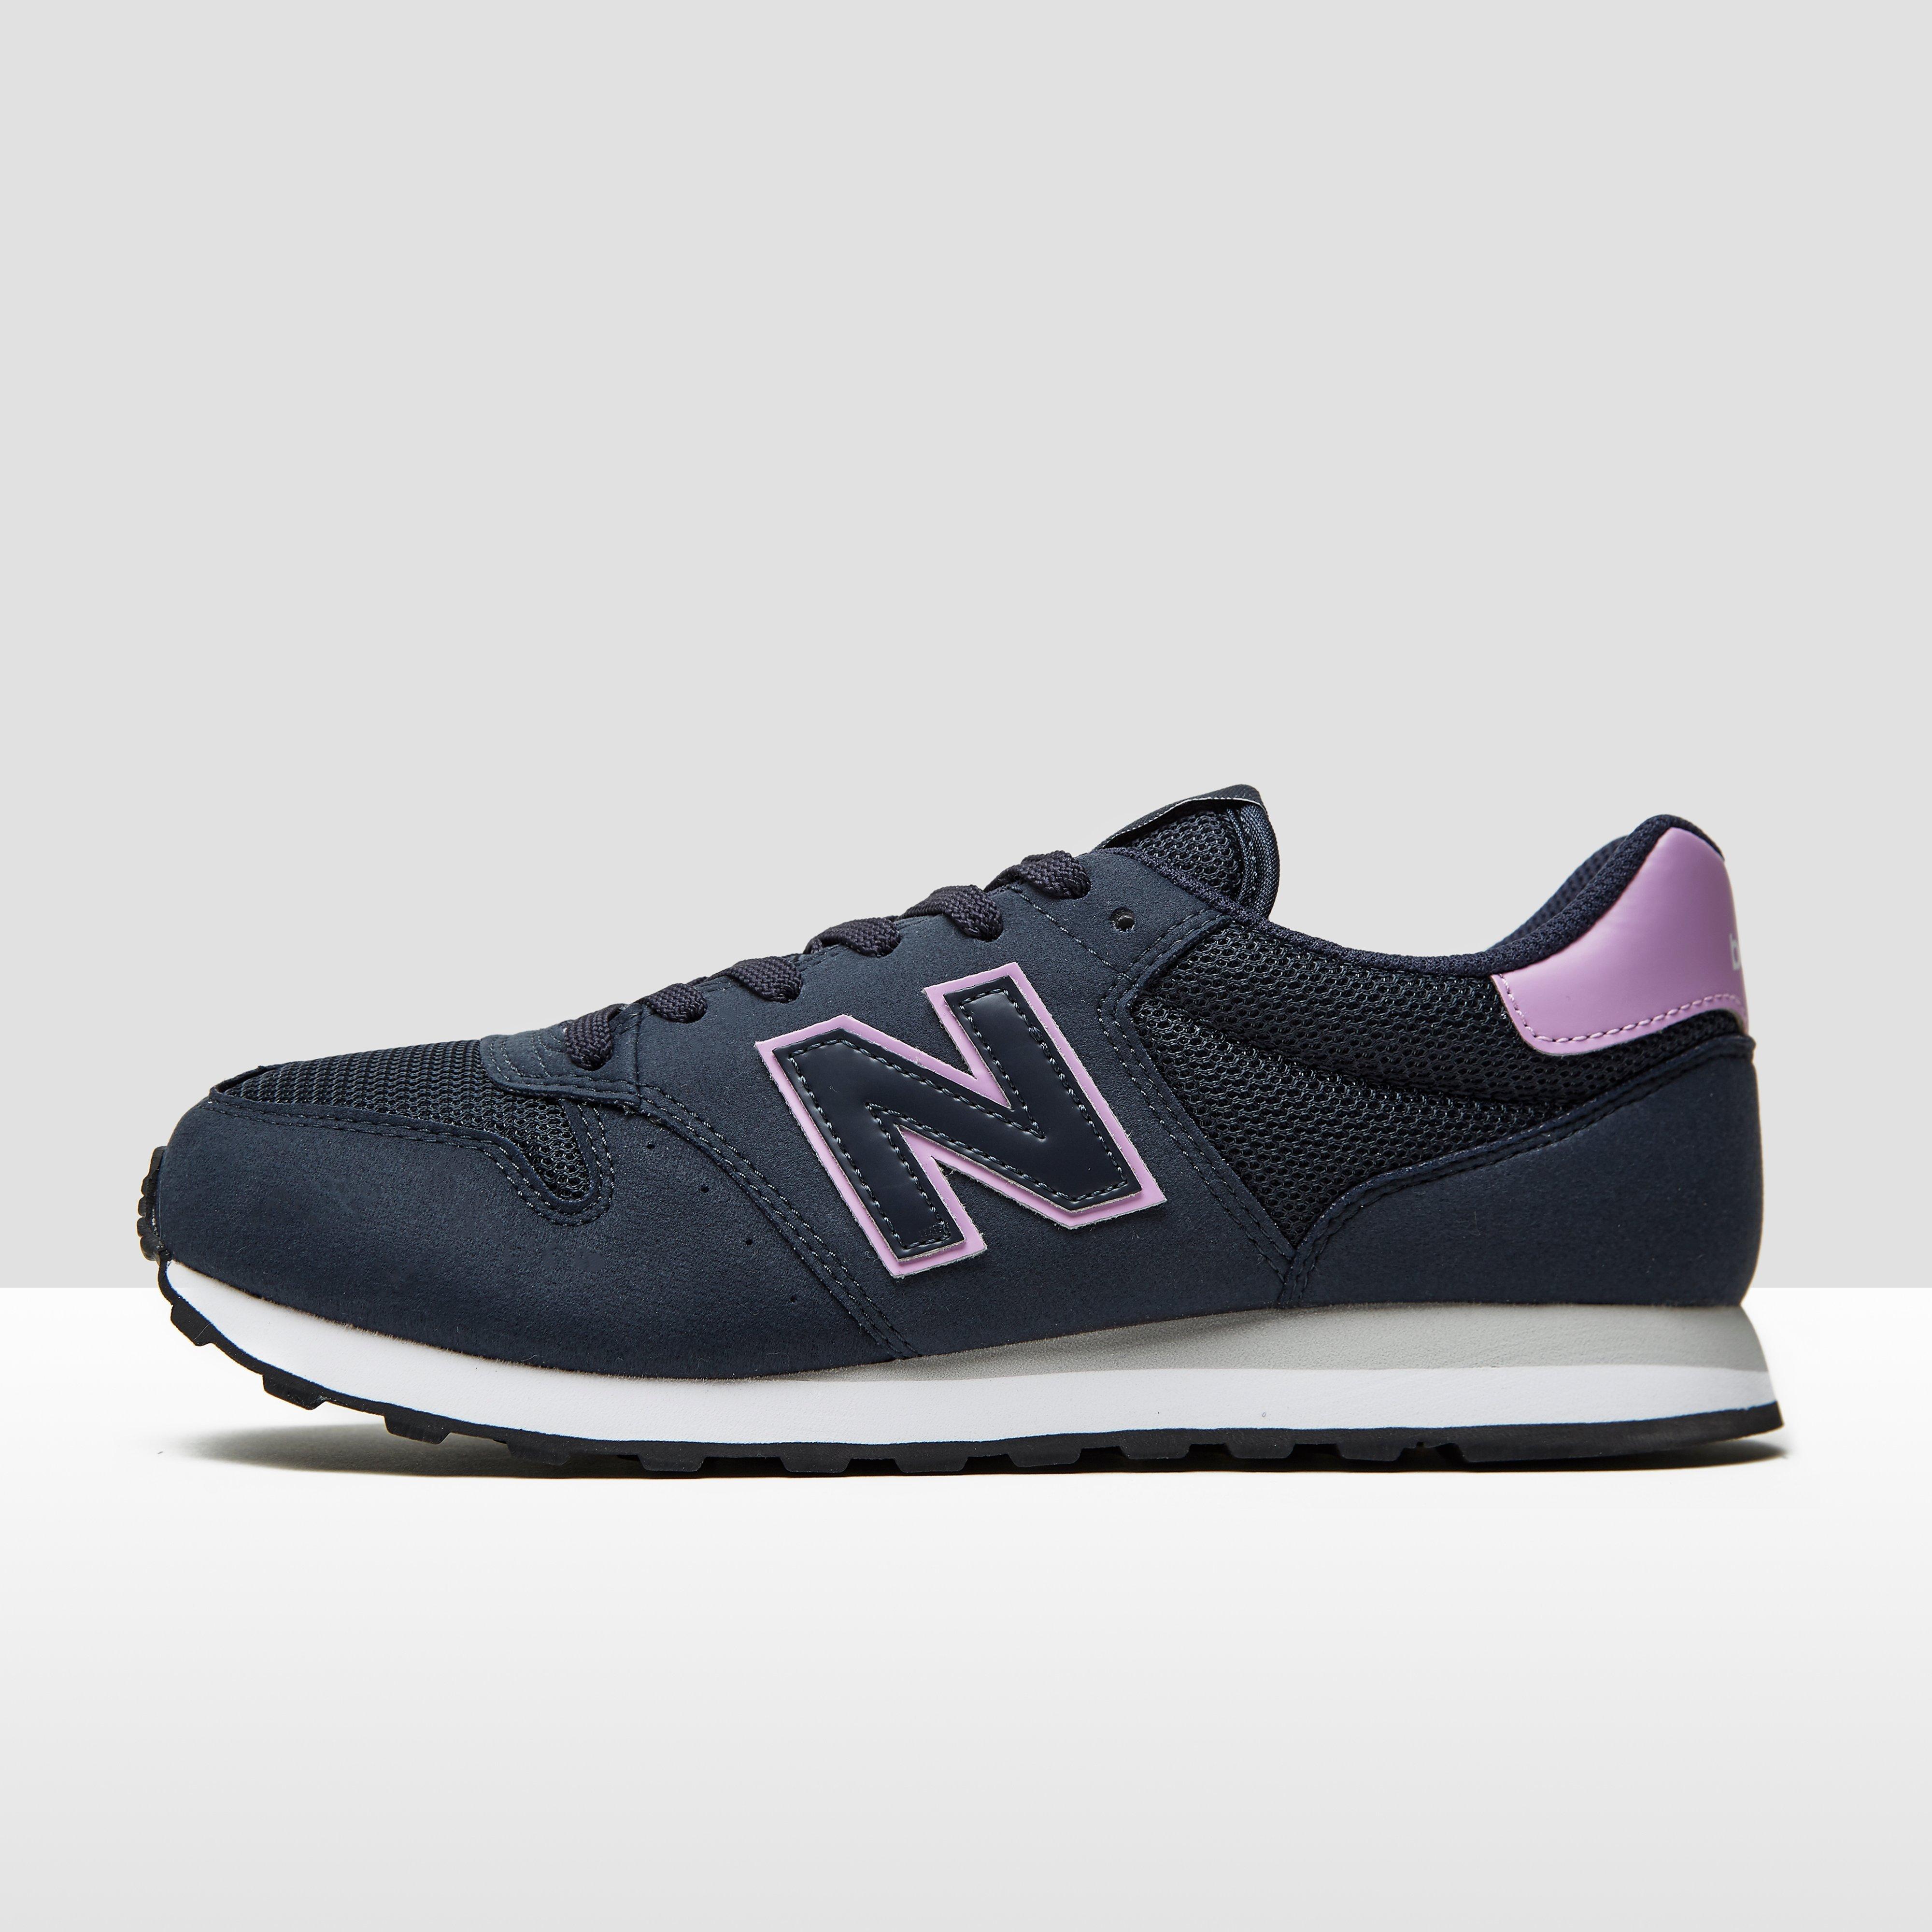 Nouvel Équilibre M 373 Chaussures Rose f6Xqex